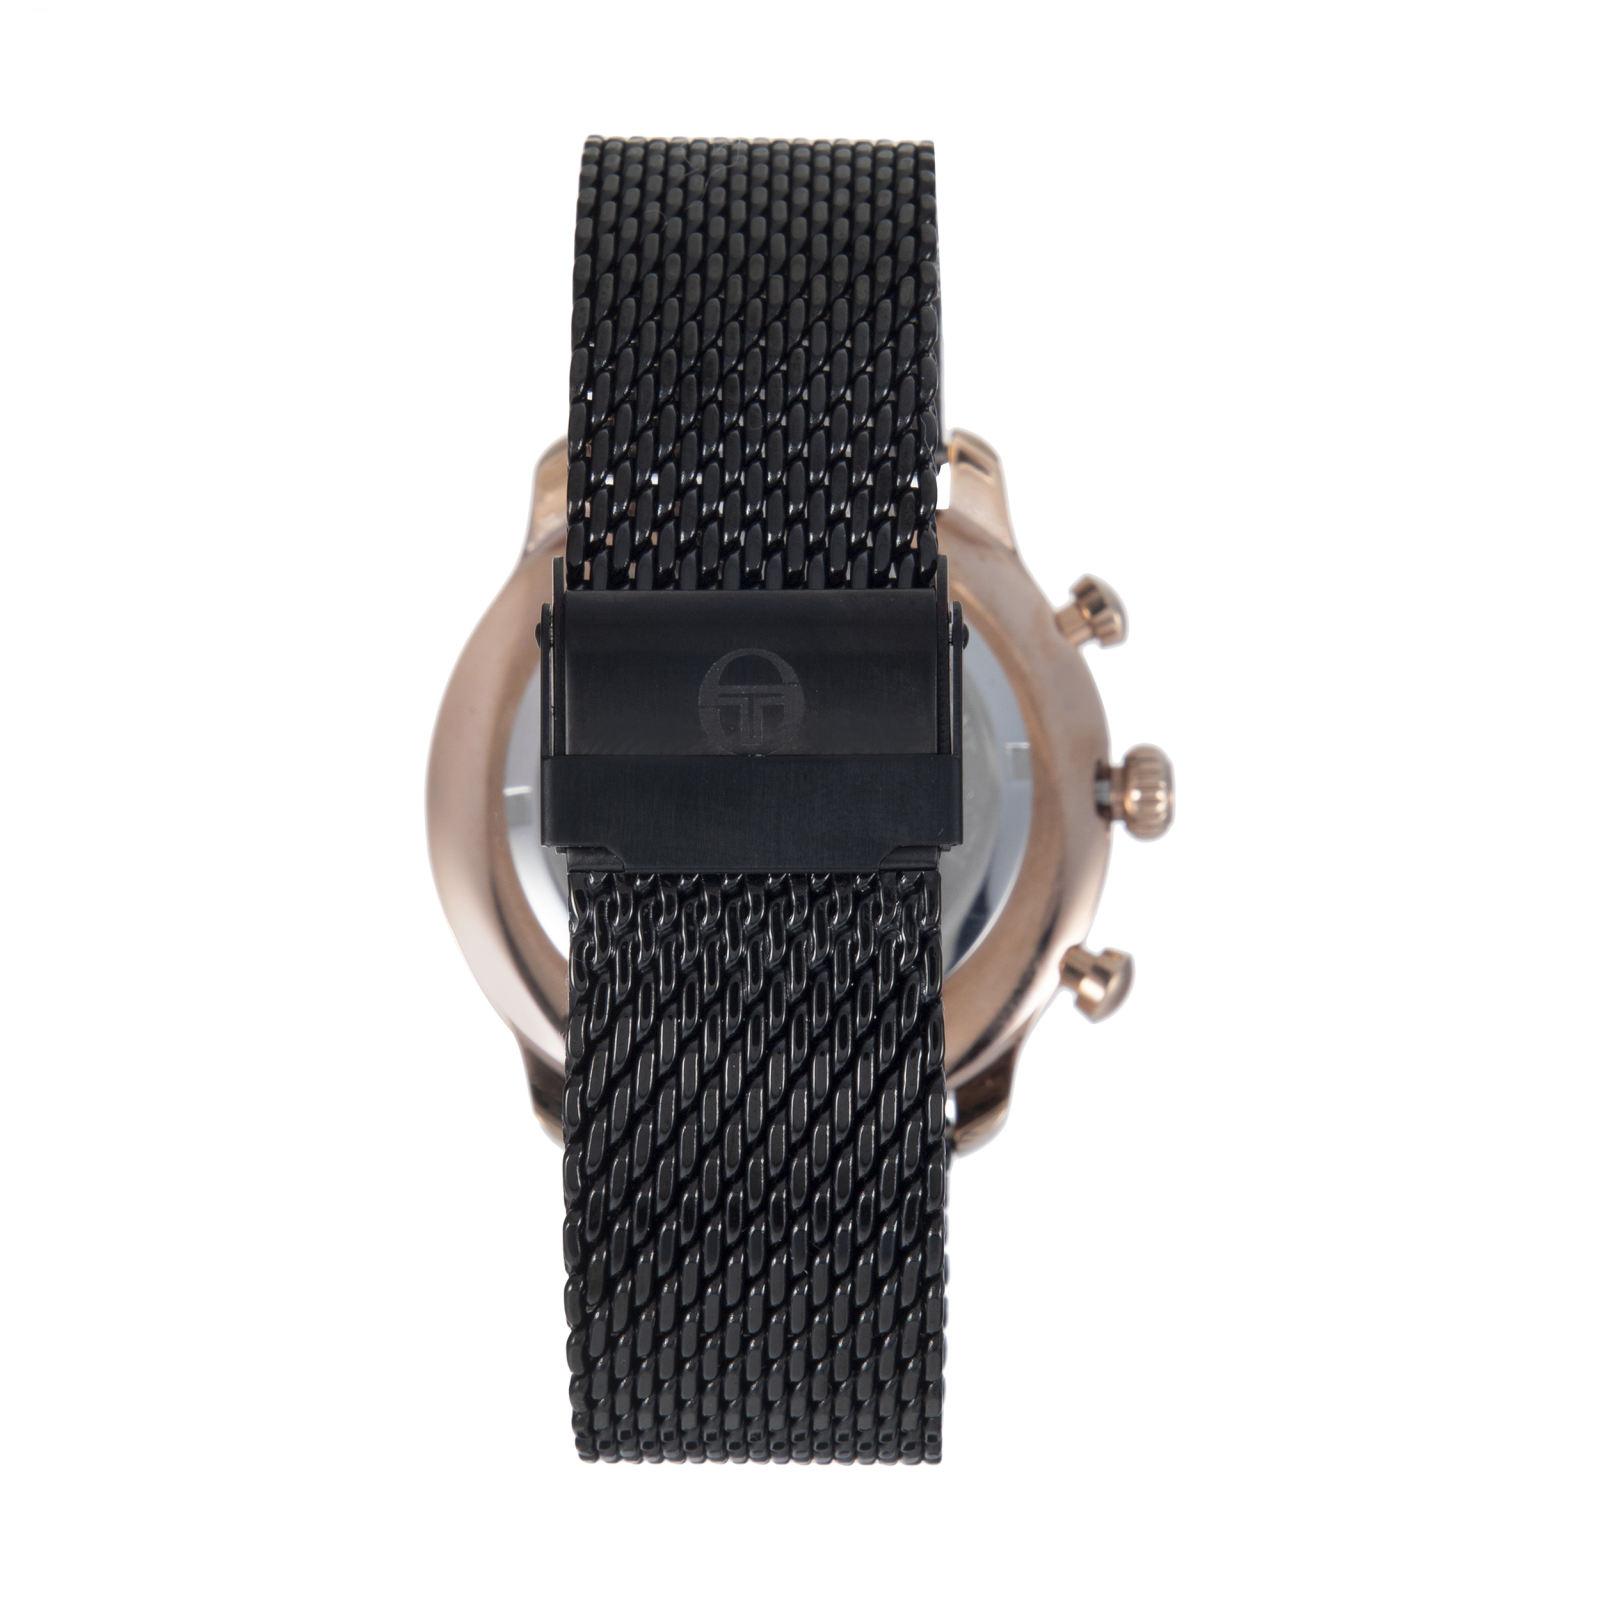 ساعت مچی عقربهای مردانه سرجیو تاچینی کد ST.2.112.03              اصل